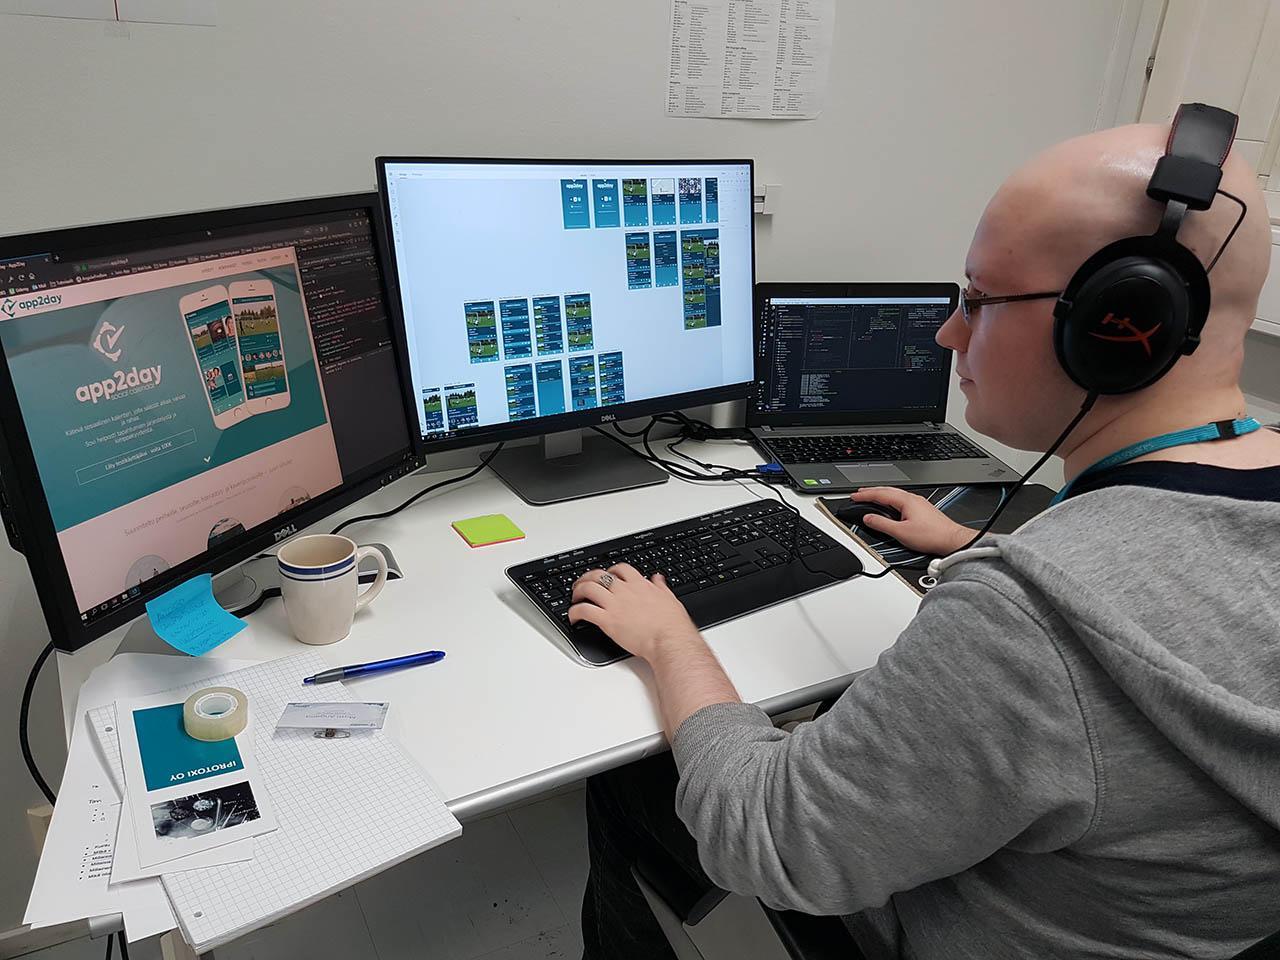 Matti designing App2Day User Interface. Autumn of growth for Tecinspire.